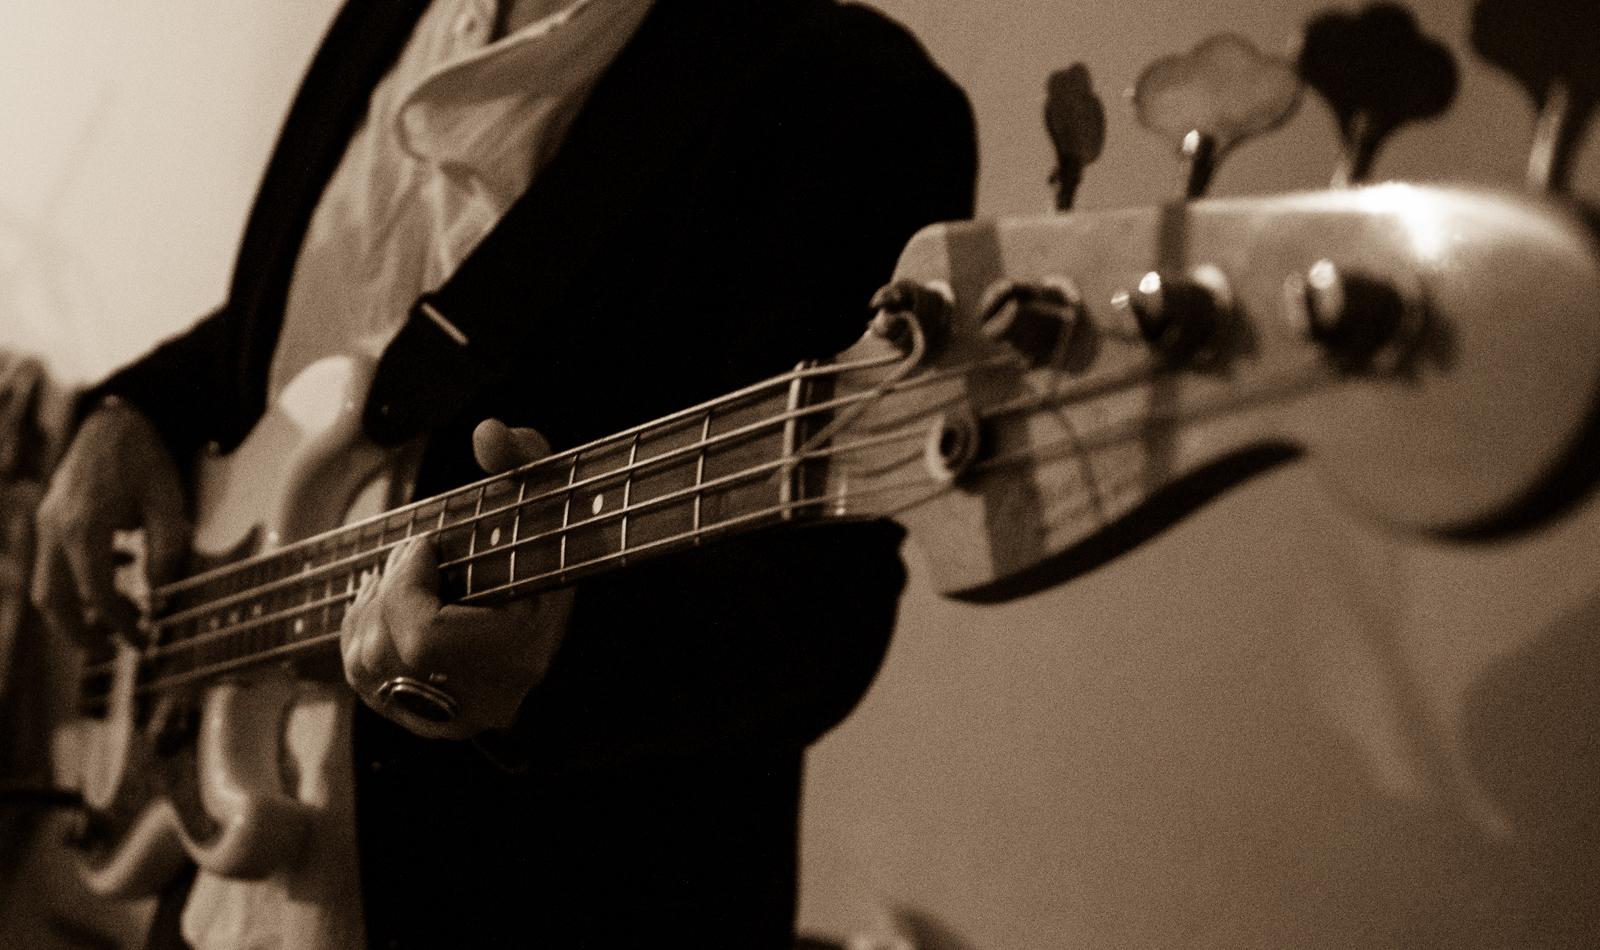 Accompanying bassist - photo by Dean Zobec